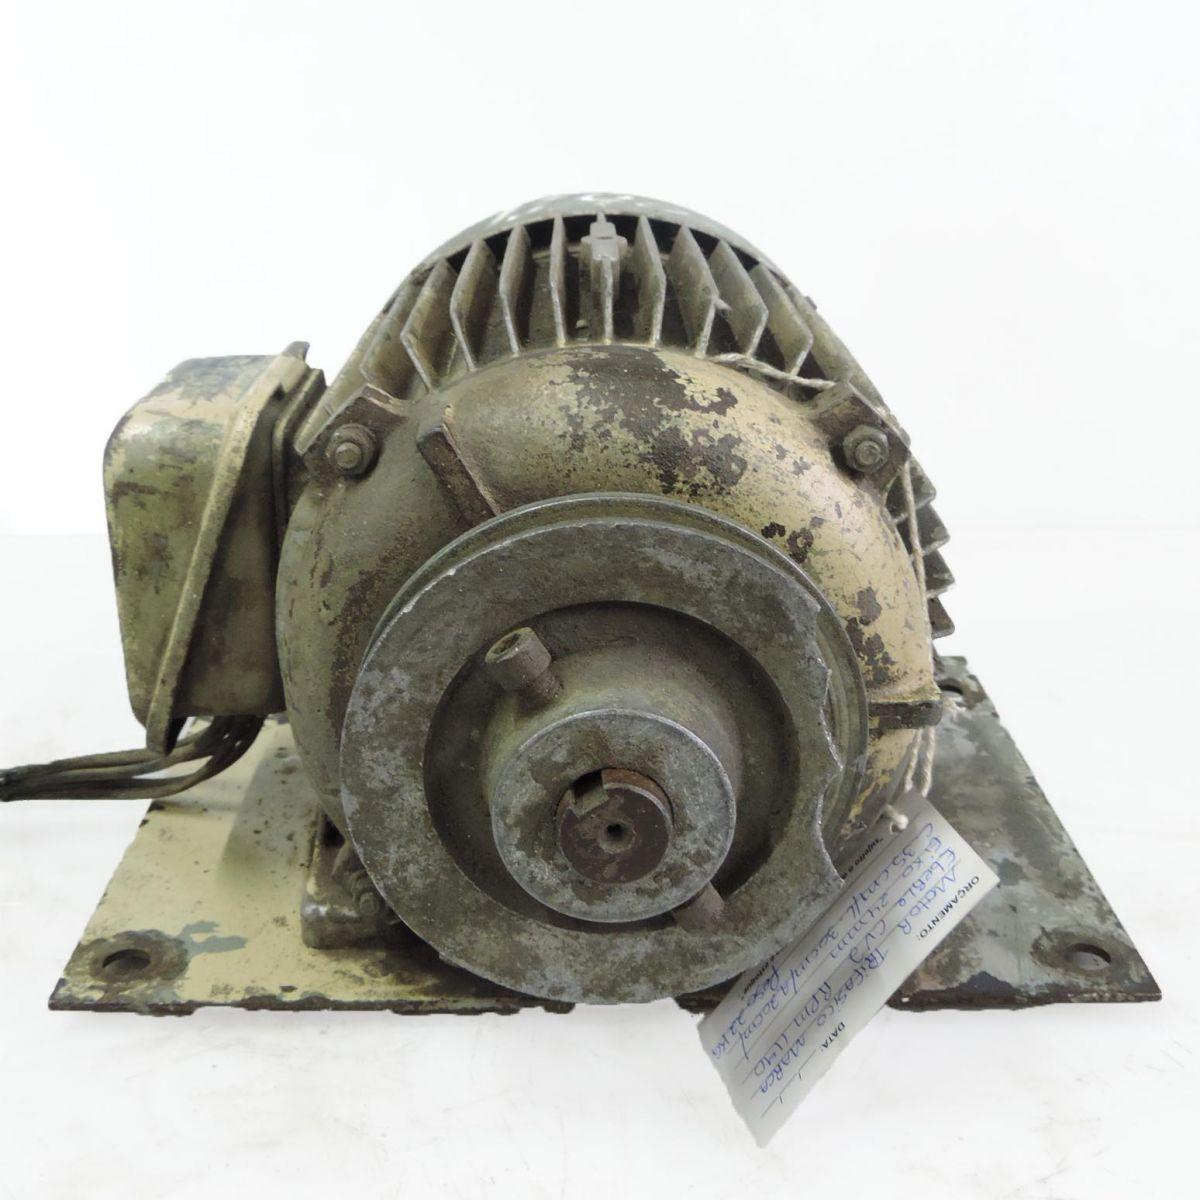 Motor Trifásico Marca Eberle F37 - 2 CV 1140 RPM